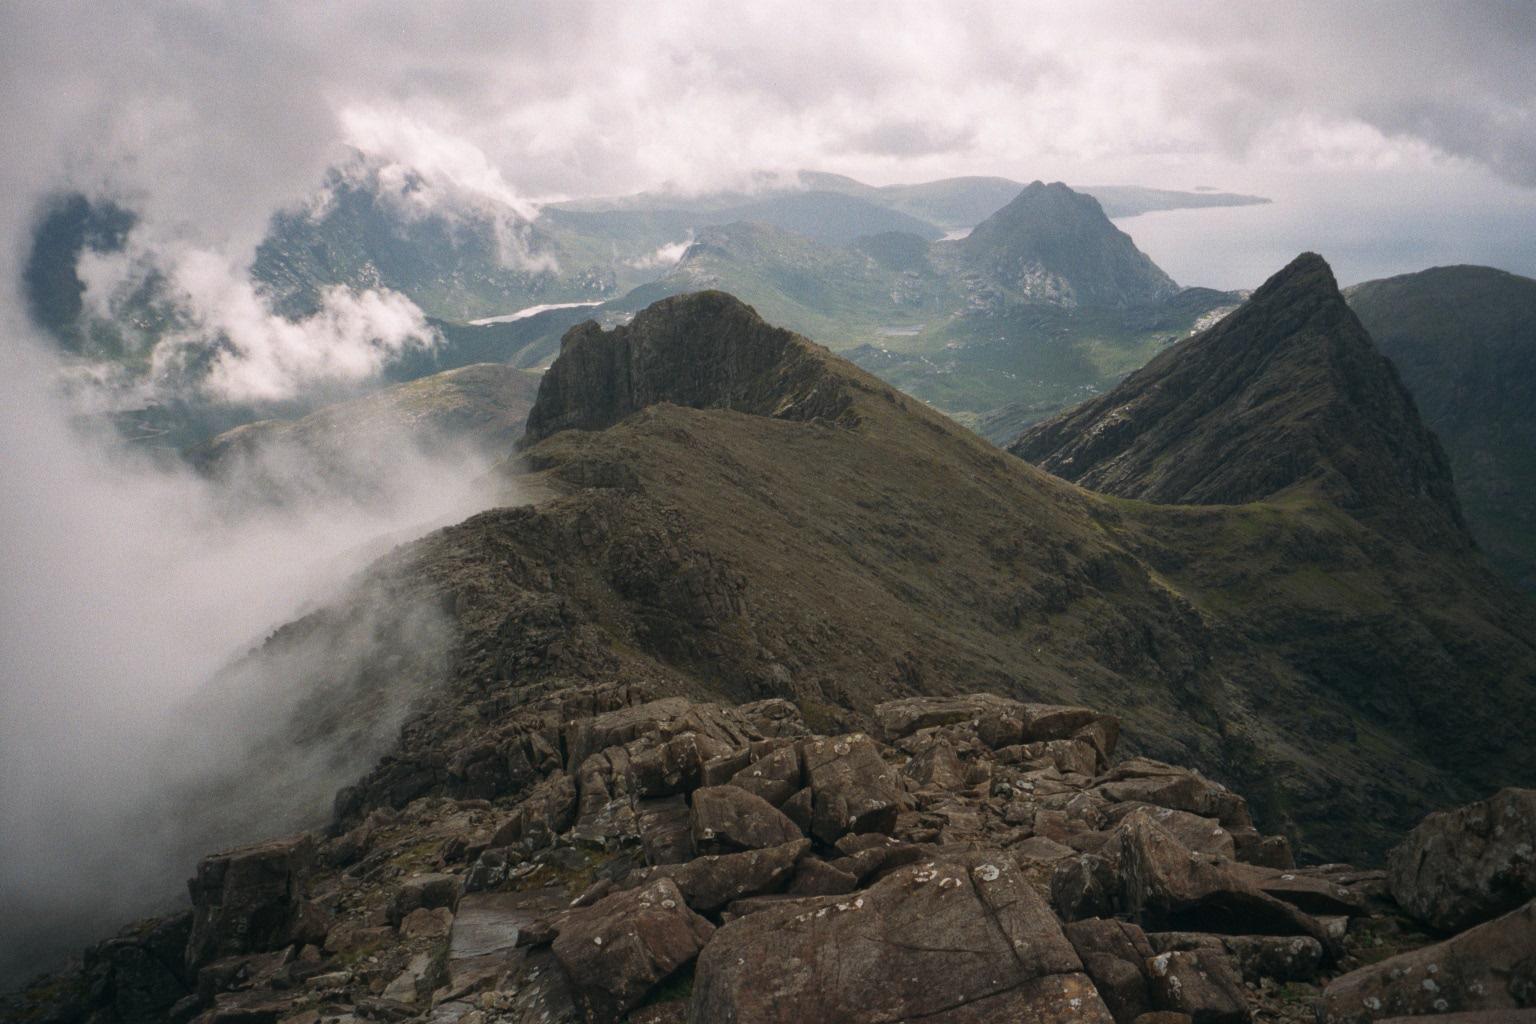 The Cuillin ridge, Skye, from Sgurr nan Gillean